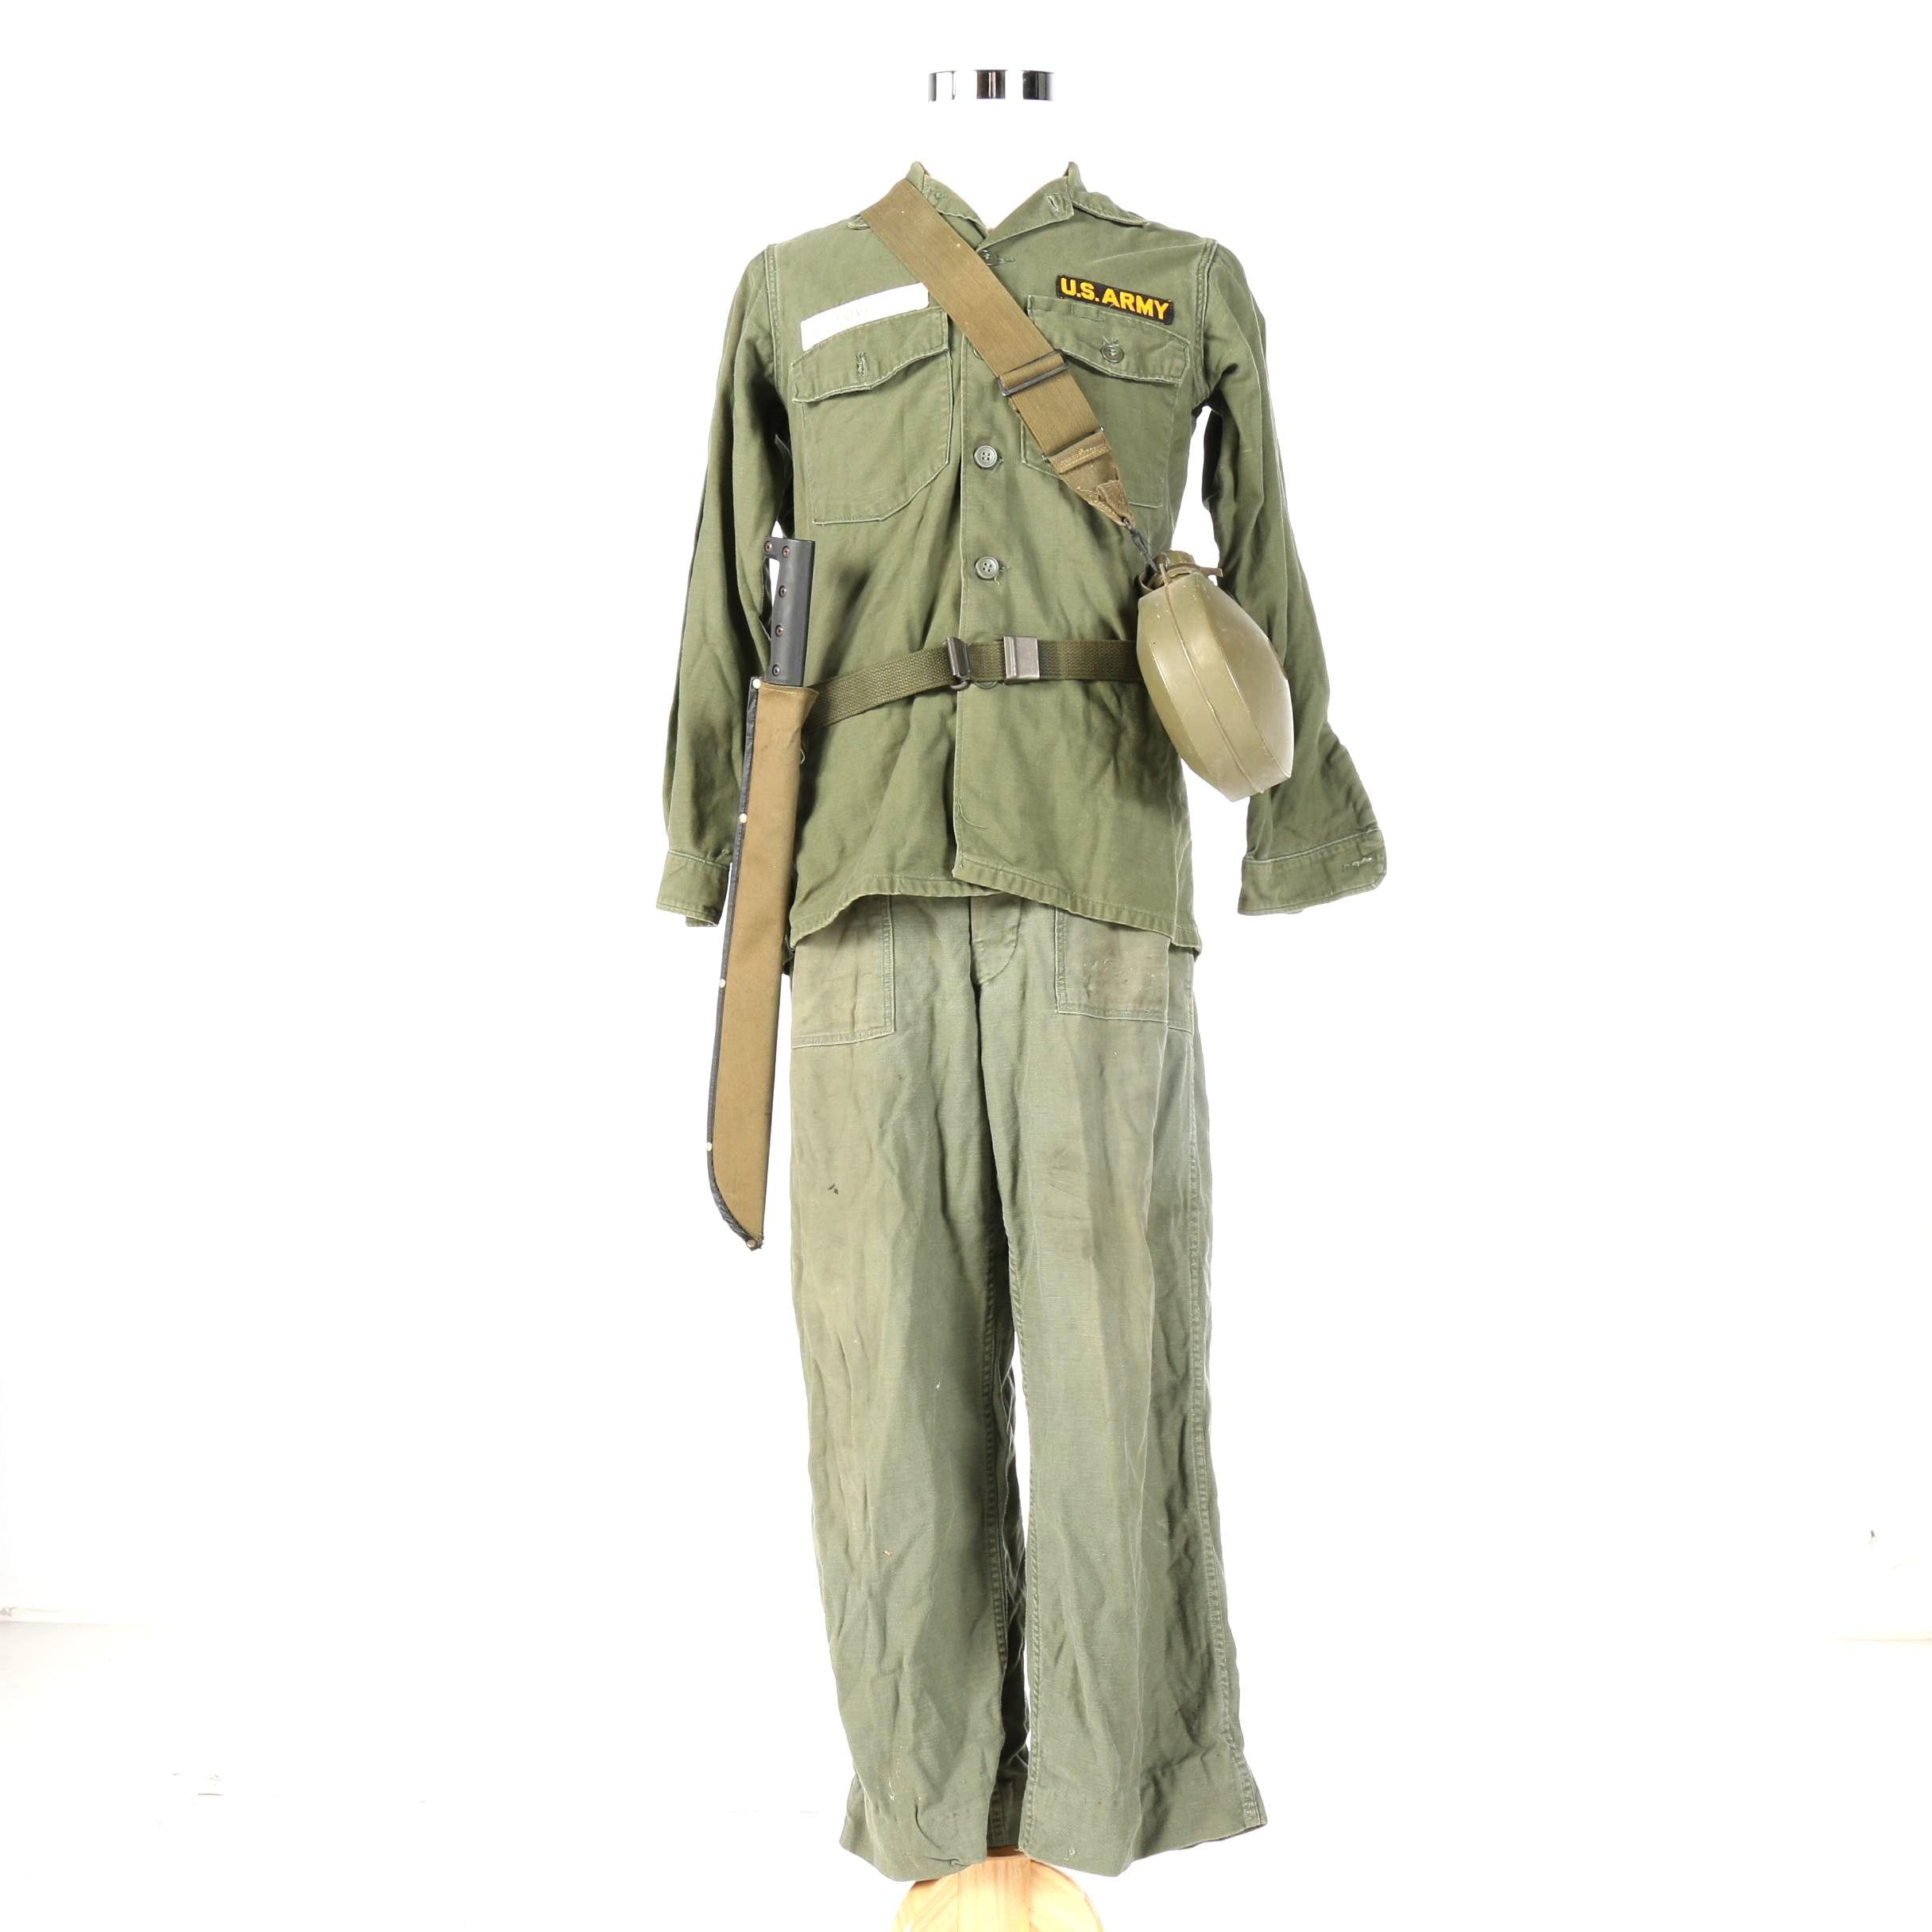 U.S. Military Uniform From the Vietnam War Era with Machete and Canteen